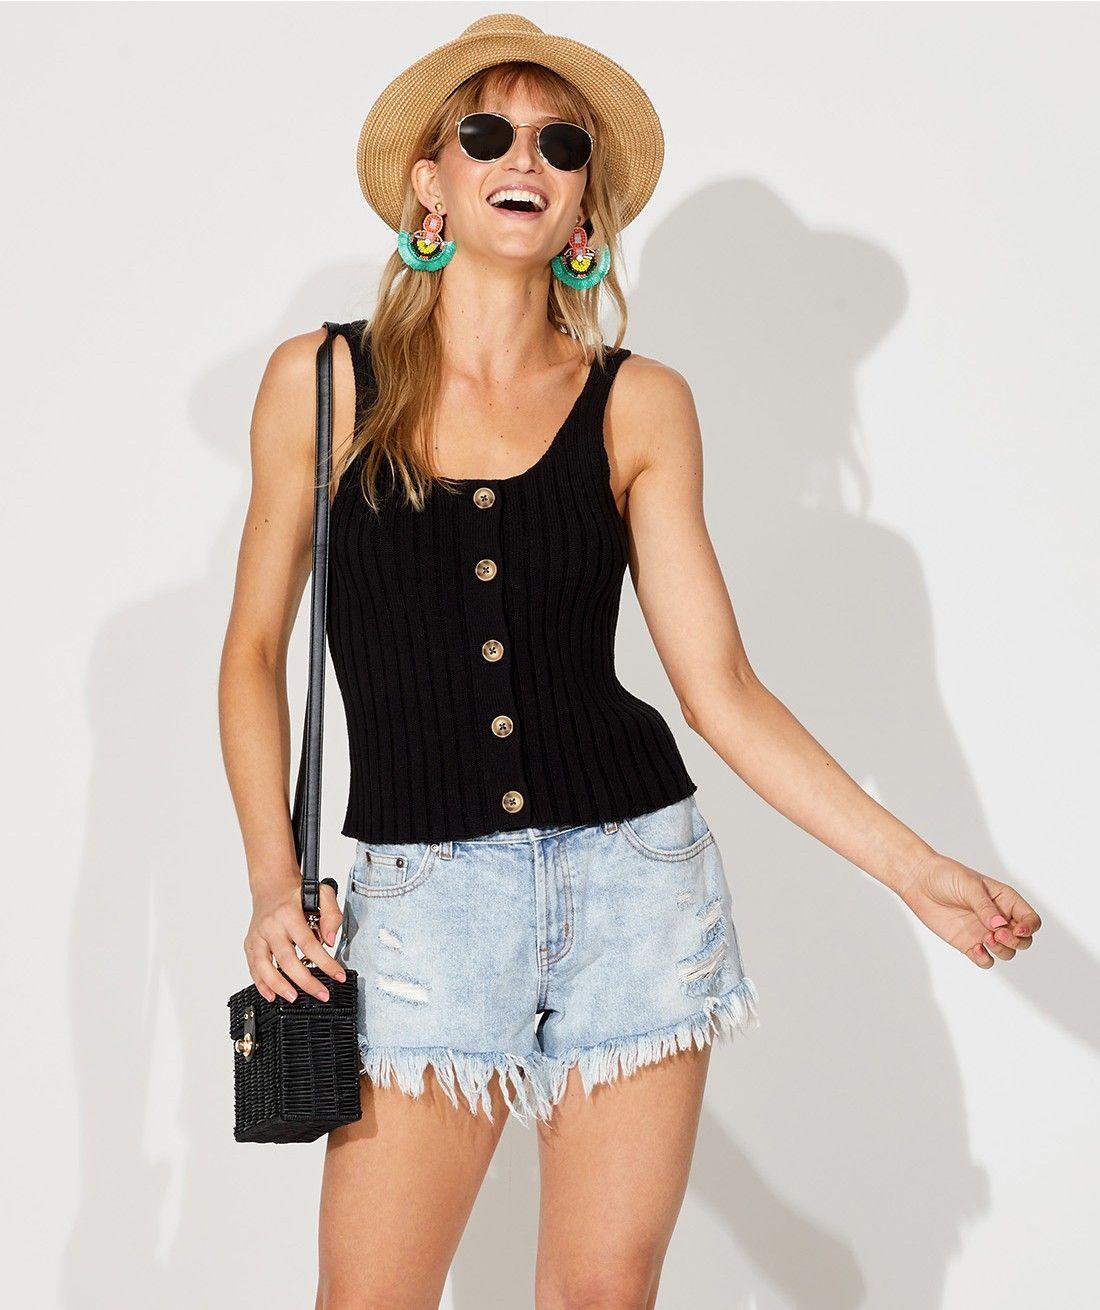 18eccabe9d Knitwear - Button Front Tank - Clothing - Sportsgirl   Clothes ...